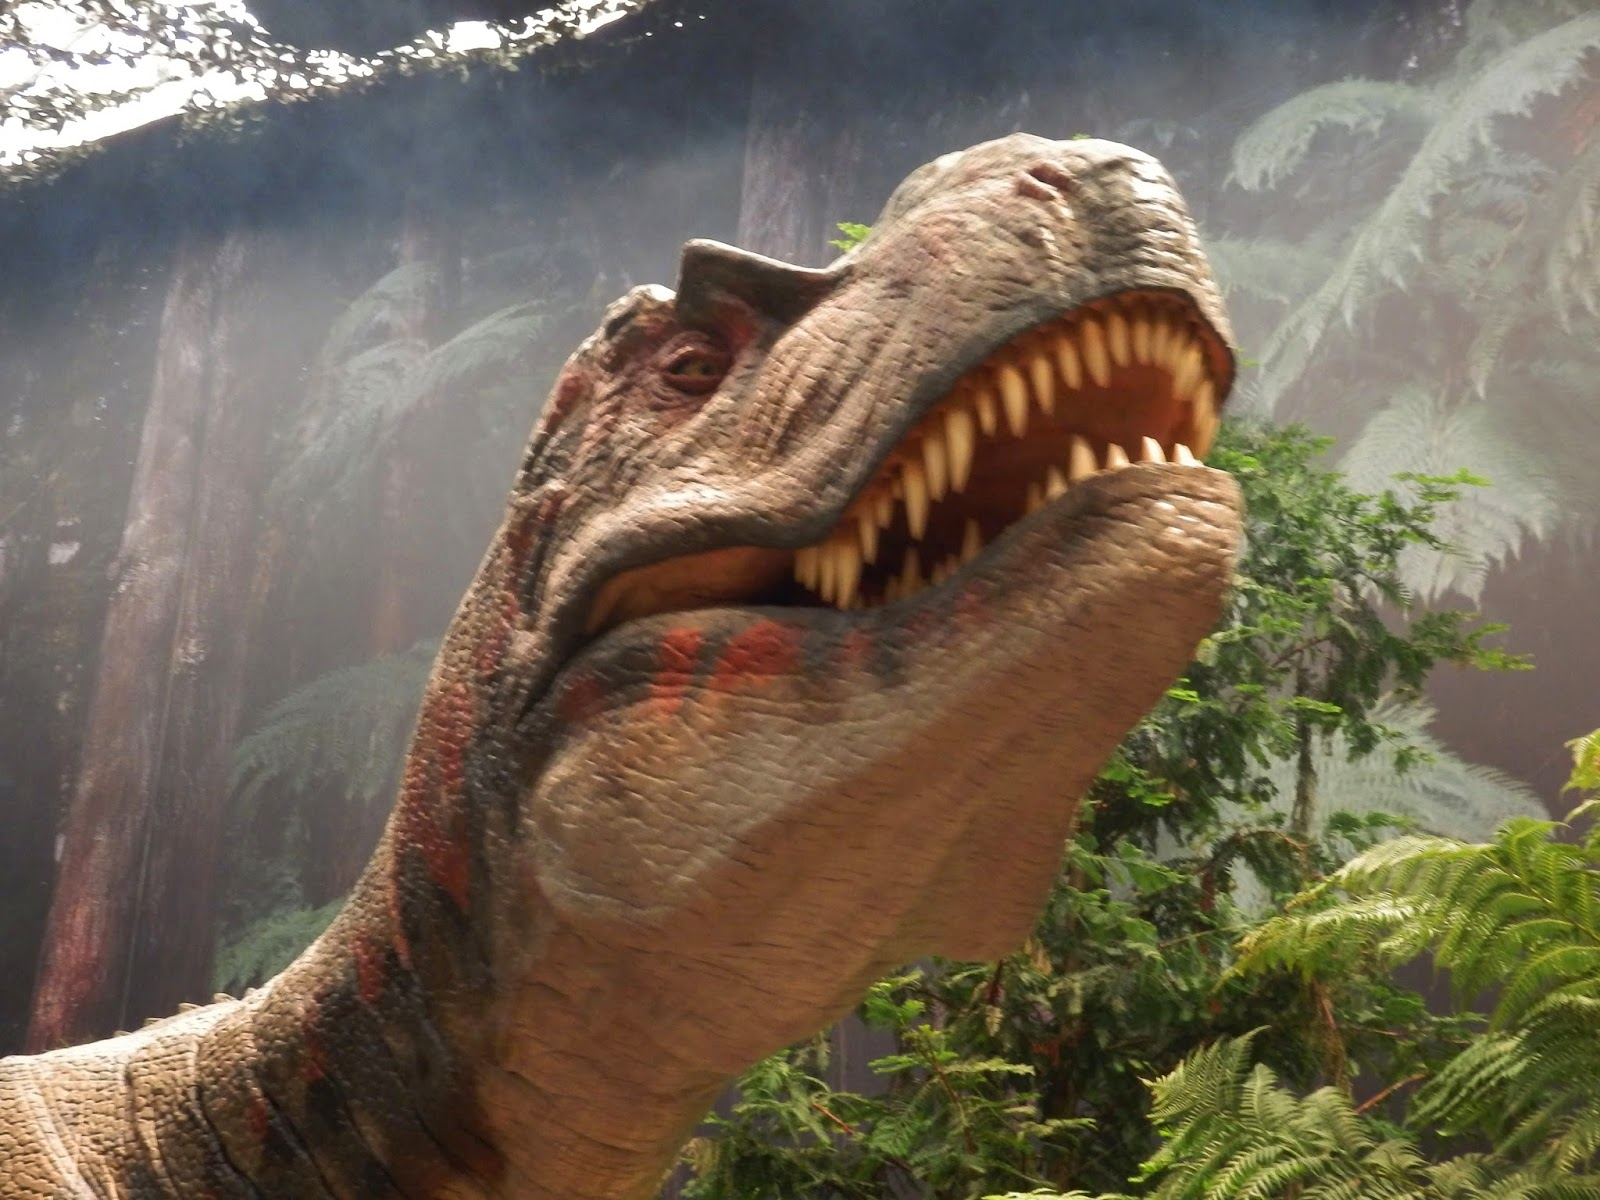 Dinosaur at Eden, St Austell